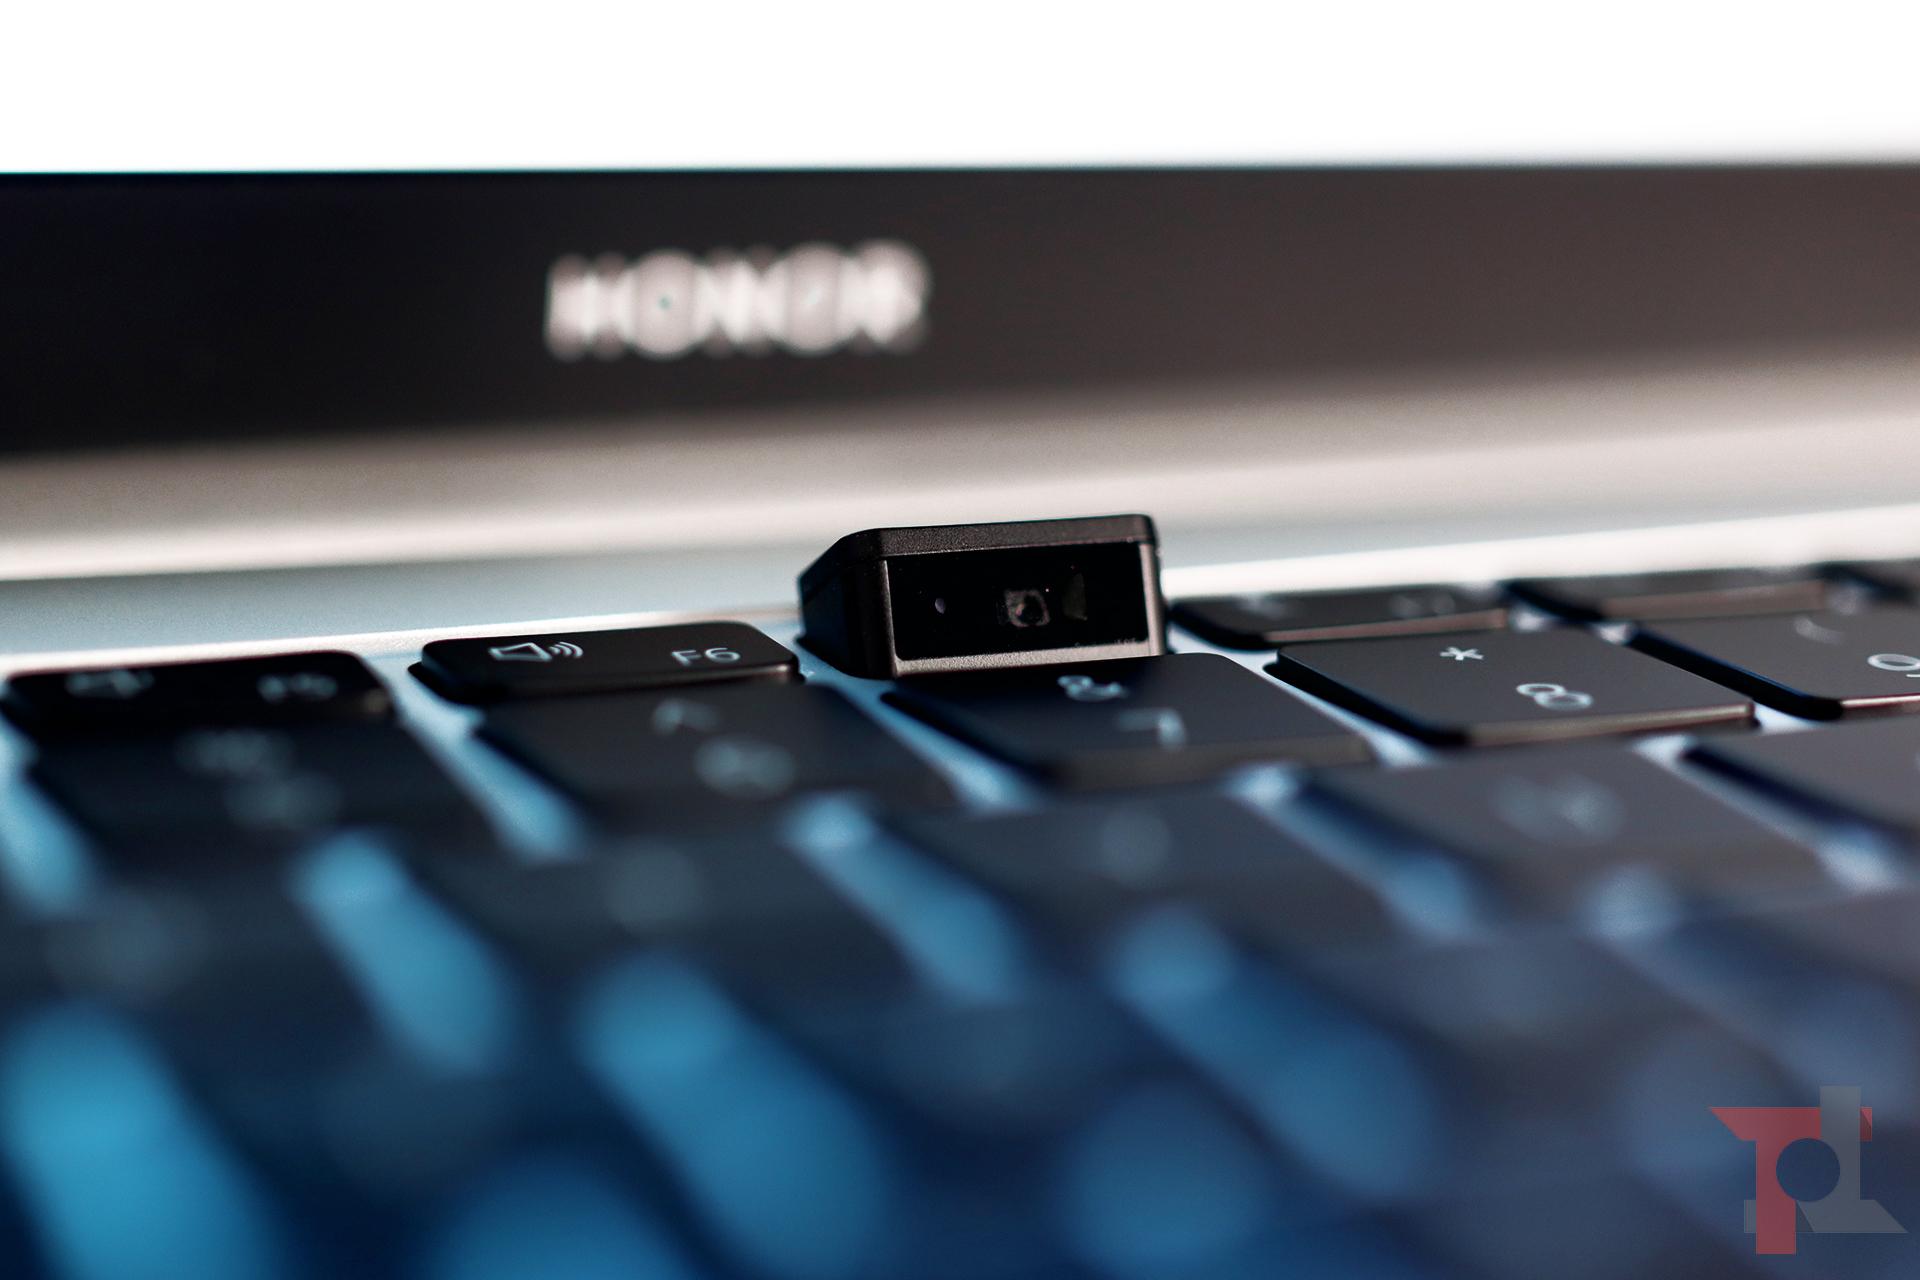 Honor MagicBook Intel camera